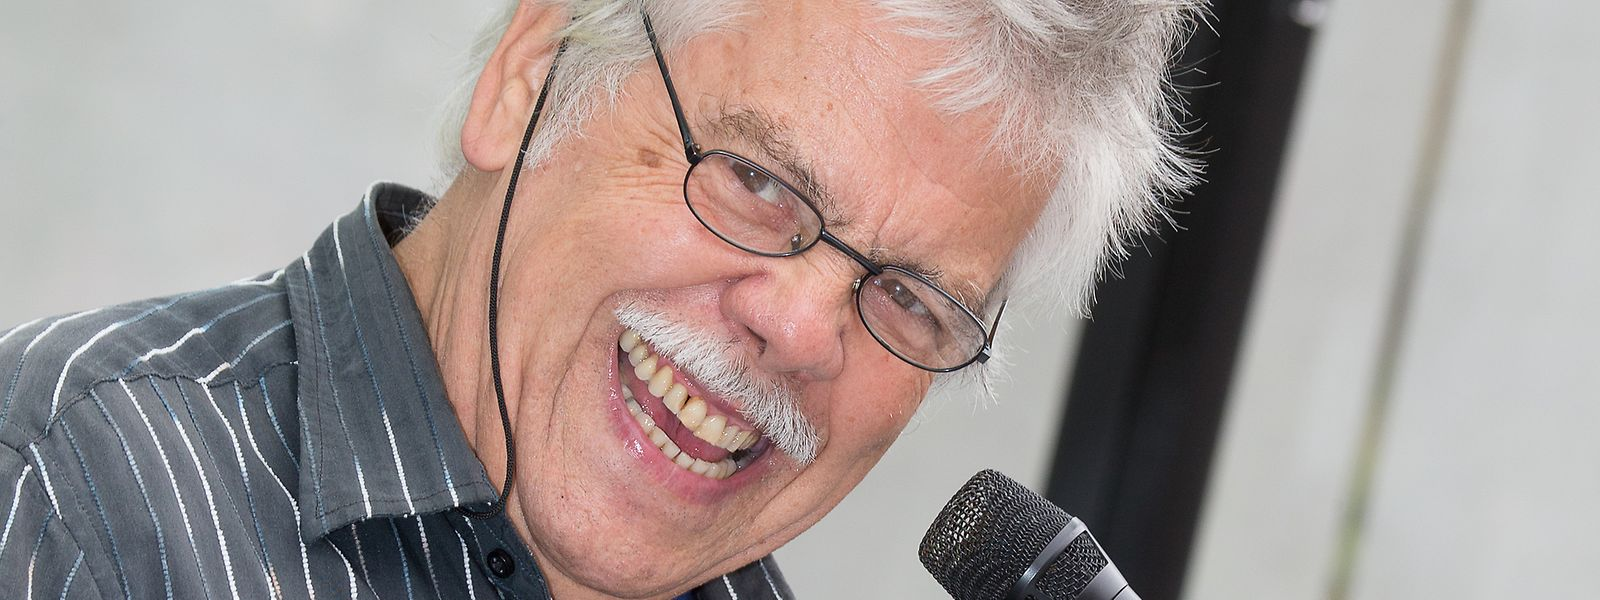 Seit sechs Jahrzehnten ist Faustino Cima als Fausti ein Fixstern an Luxemburgs Musikhimmel.